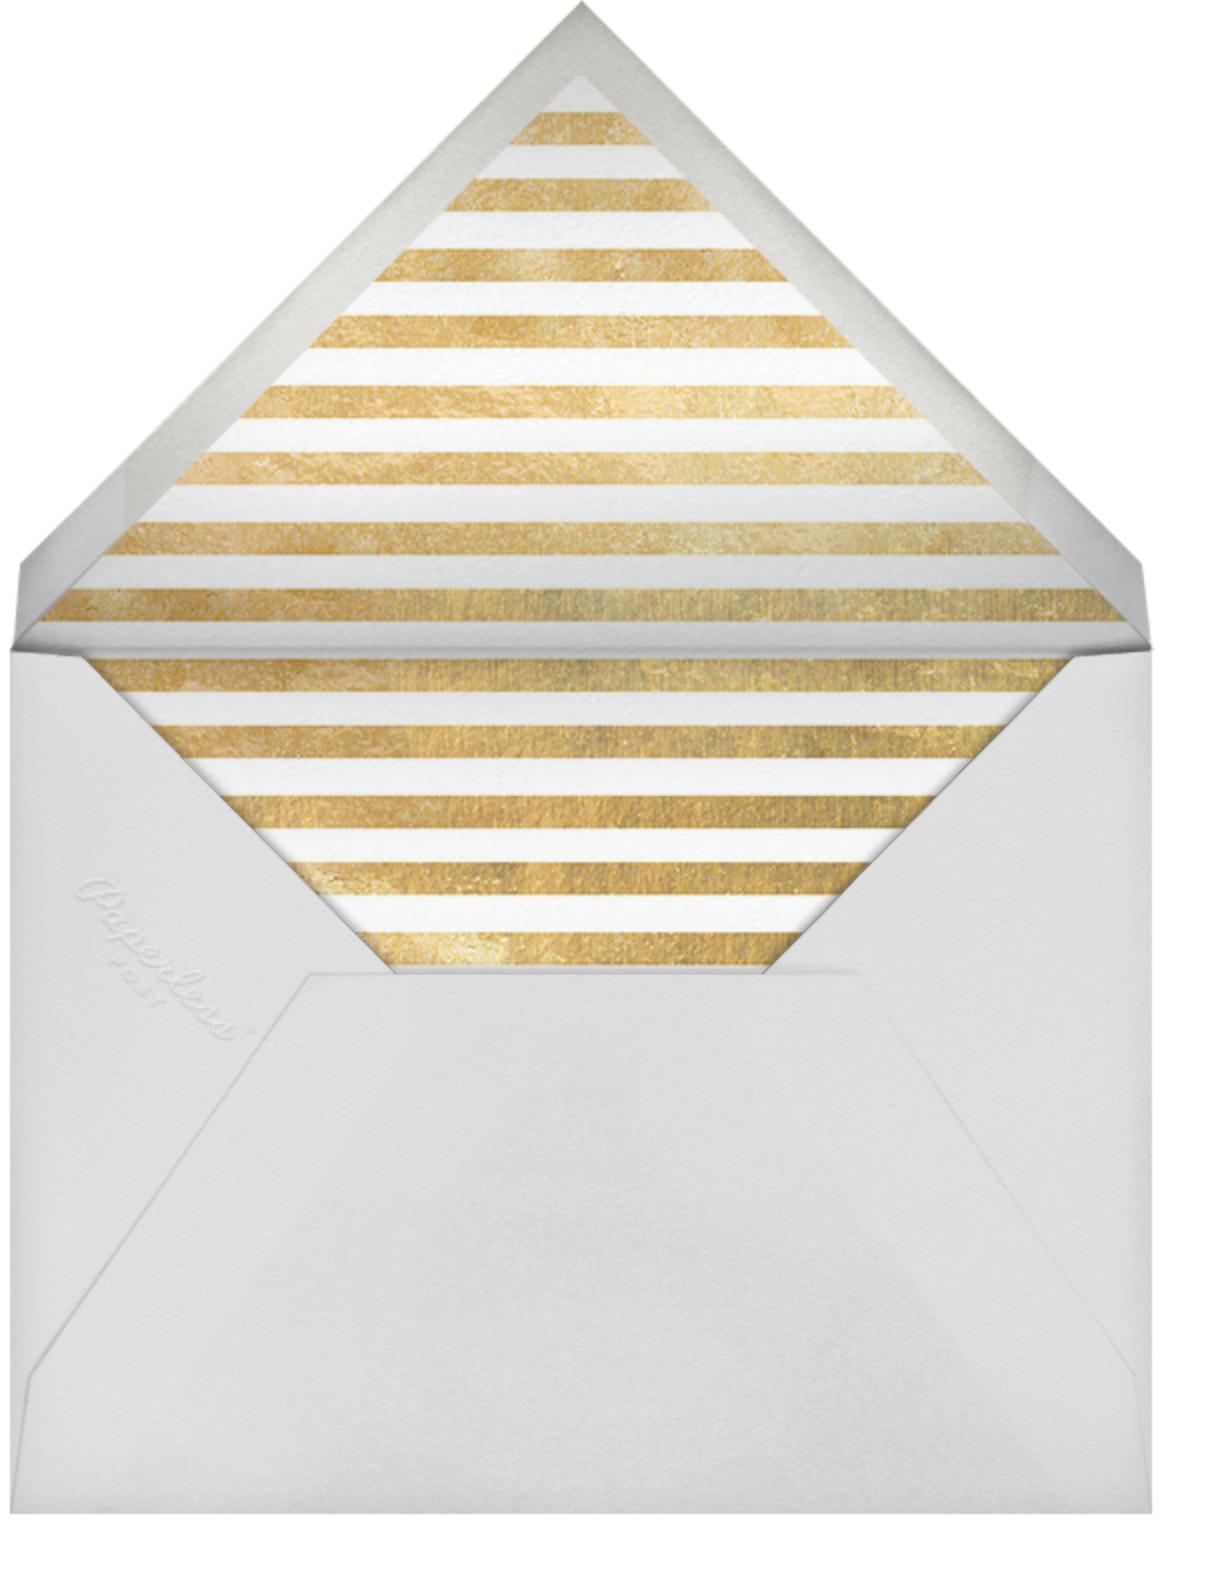 Confetti Horizontal (Double-Sided Photo) - Gold - kate spade new york - Graduation - envelope back